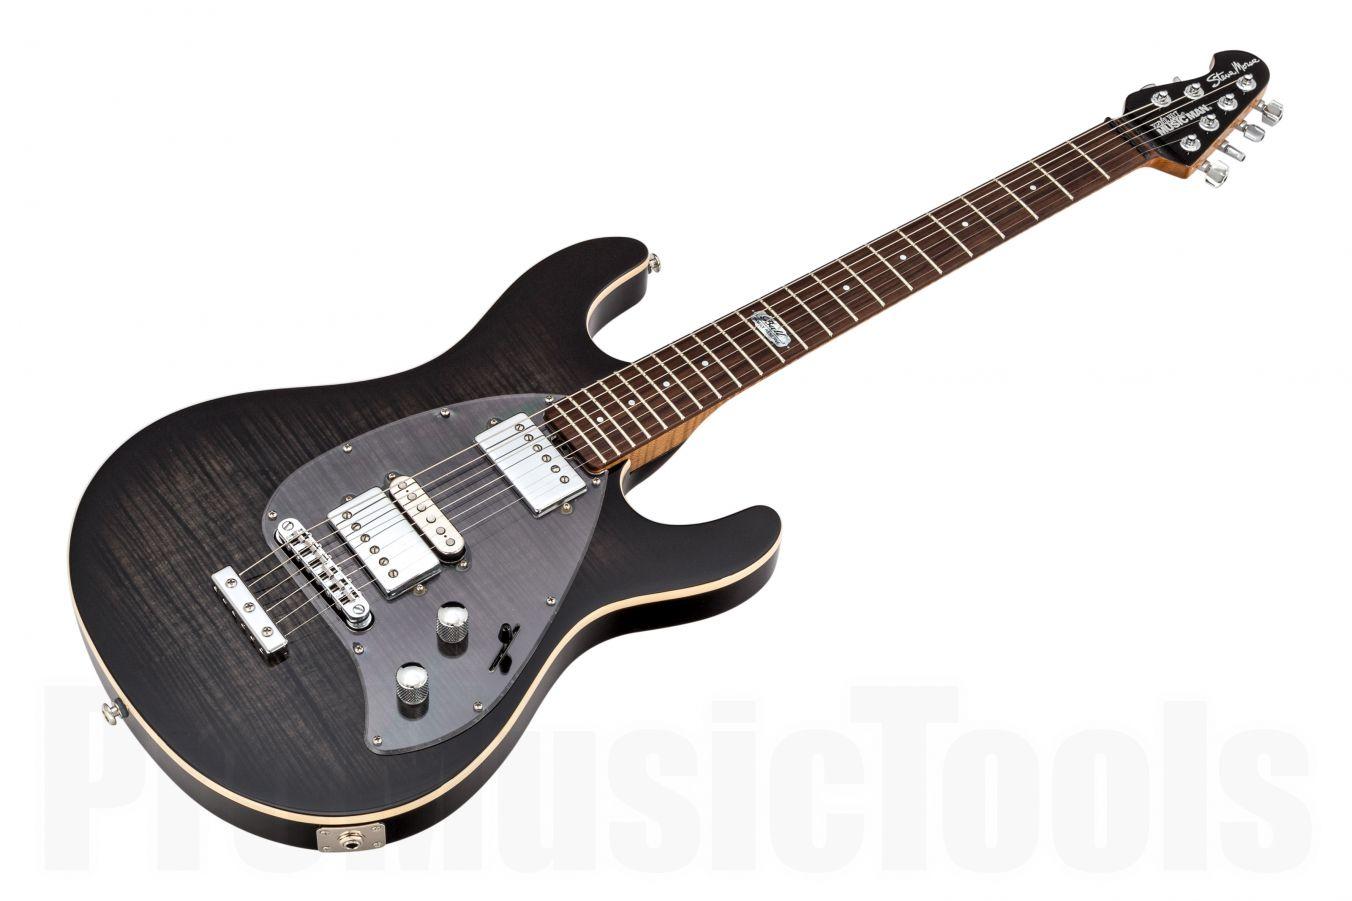 Music Man USA Steve Morse Y2D BFR Darklord Limited Edition BKB - Black Burst - Reverse Headstock